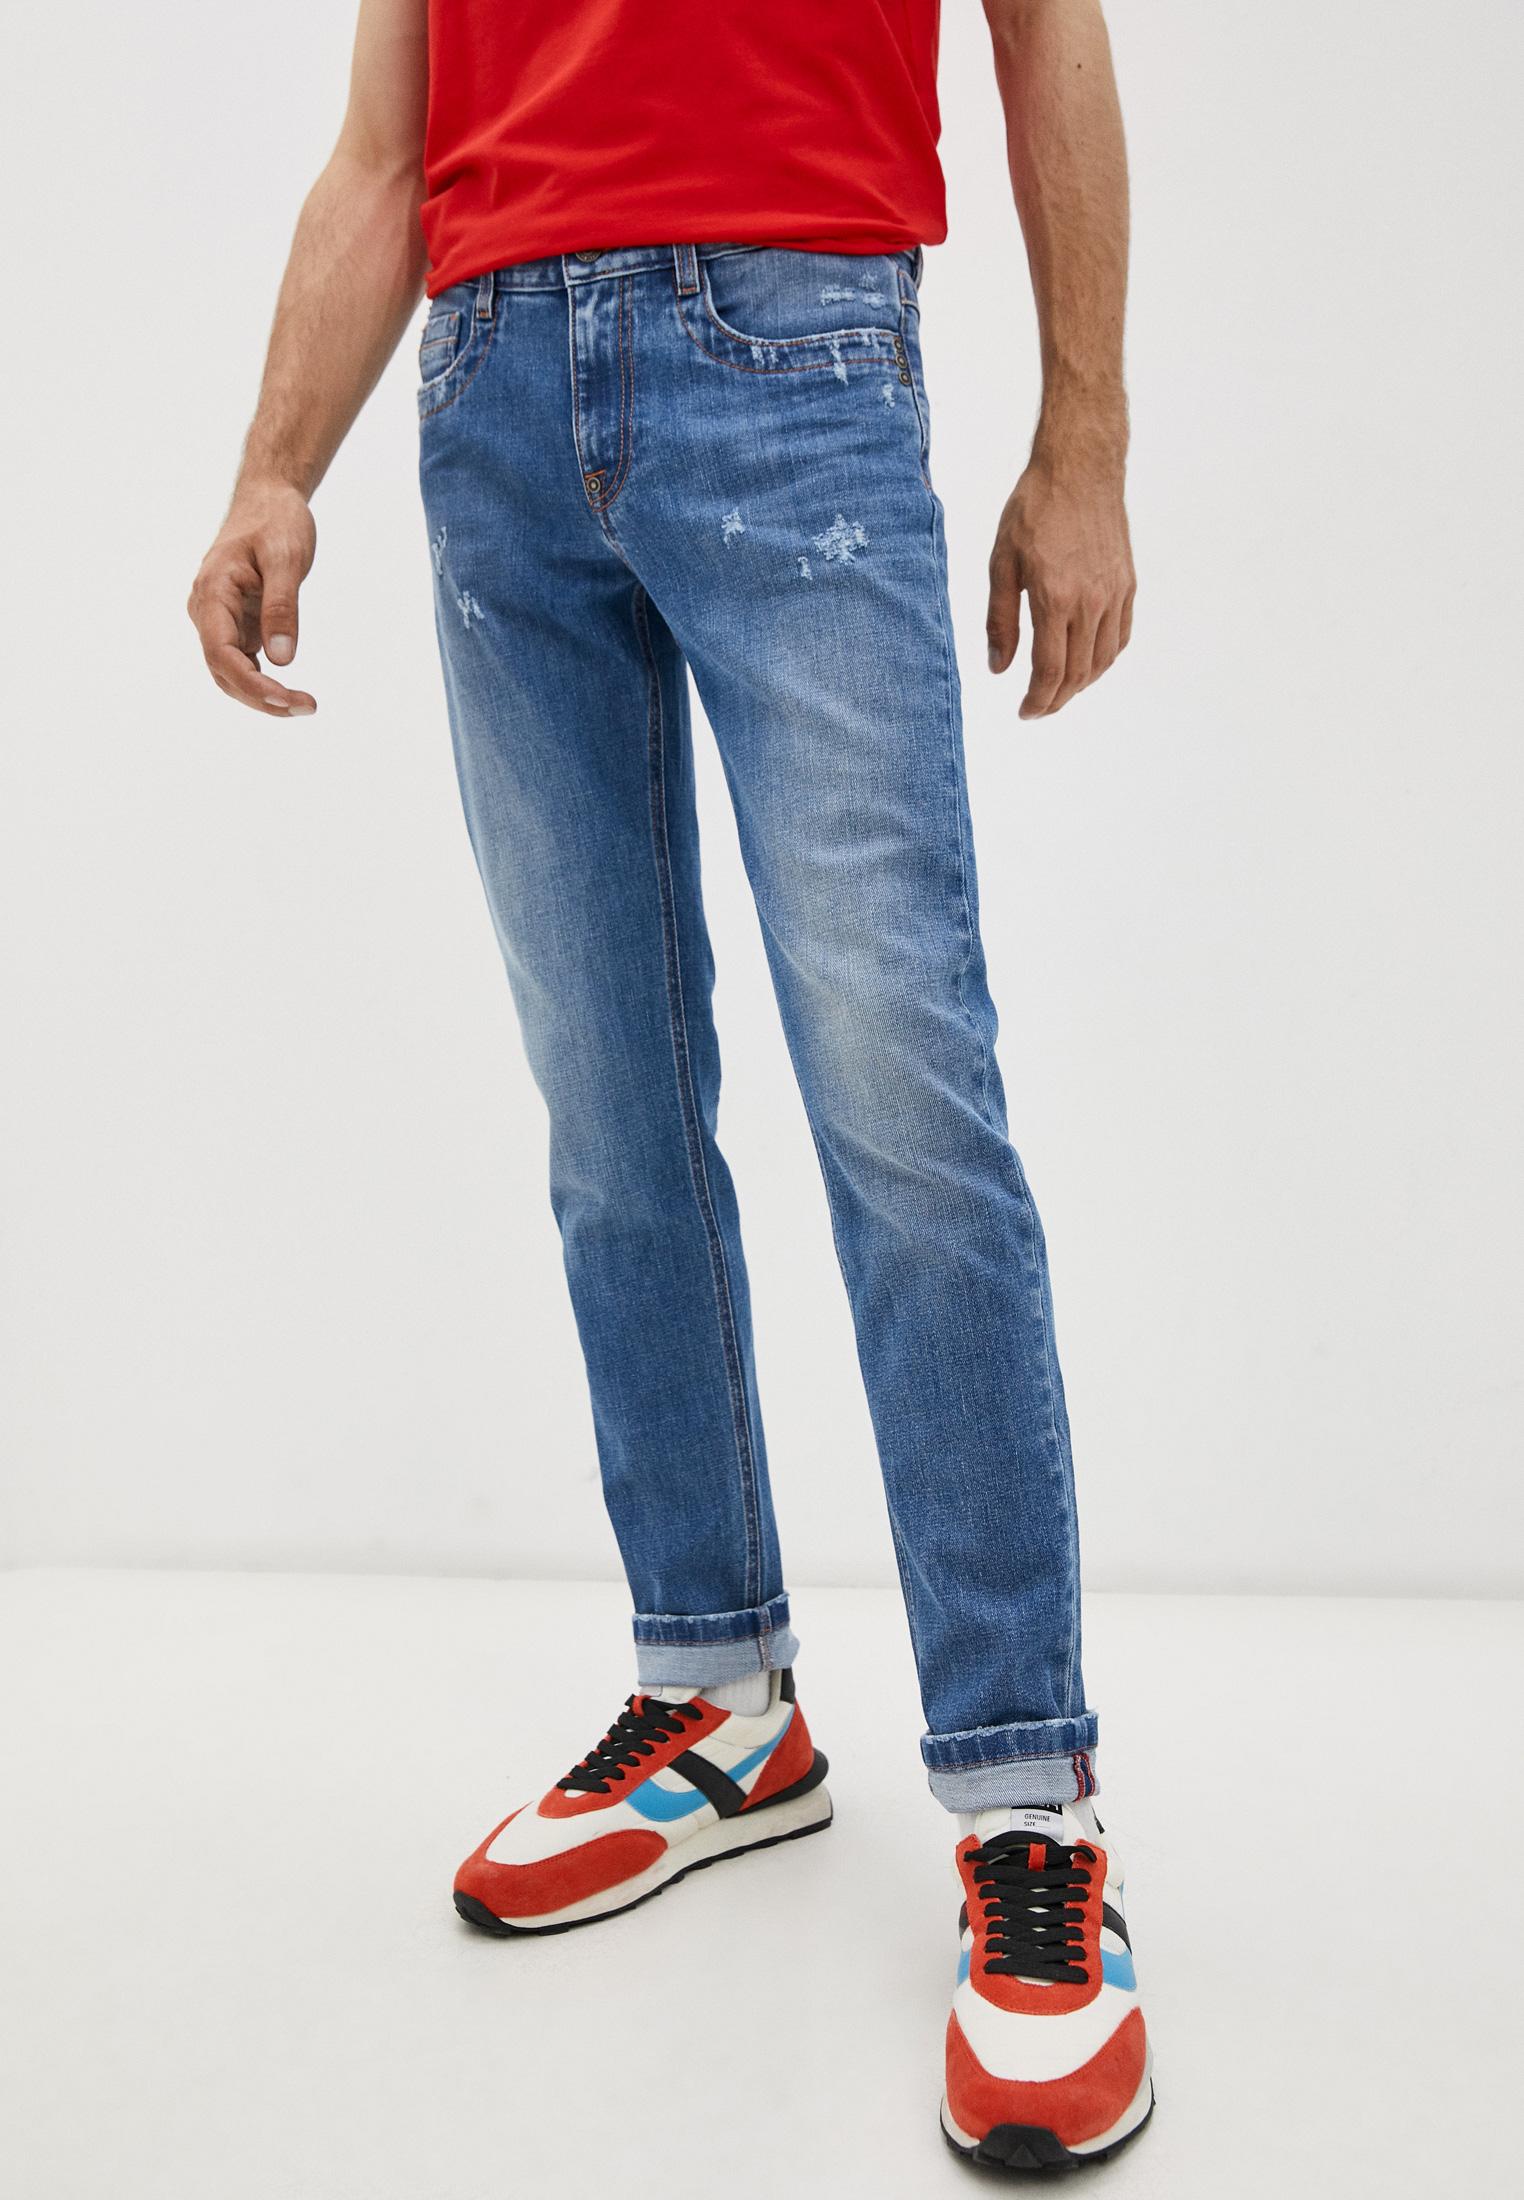 Мужские зауженные джинсы Bikkembergs (Биккембергс) C Q 101 03 S 3393